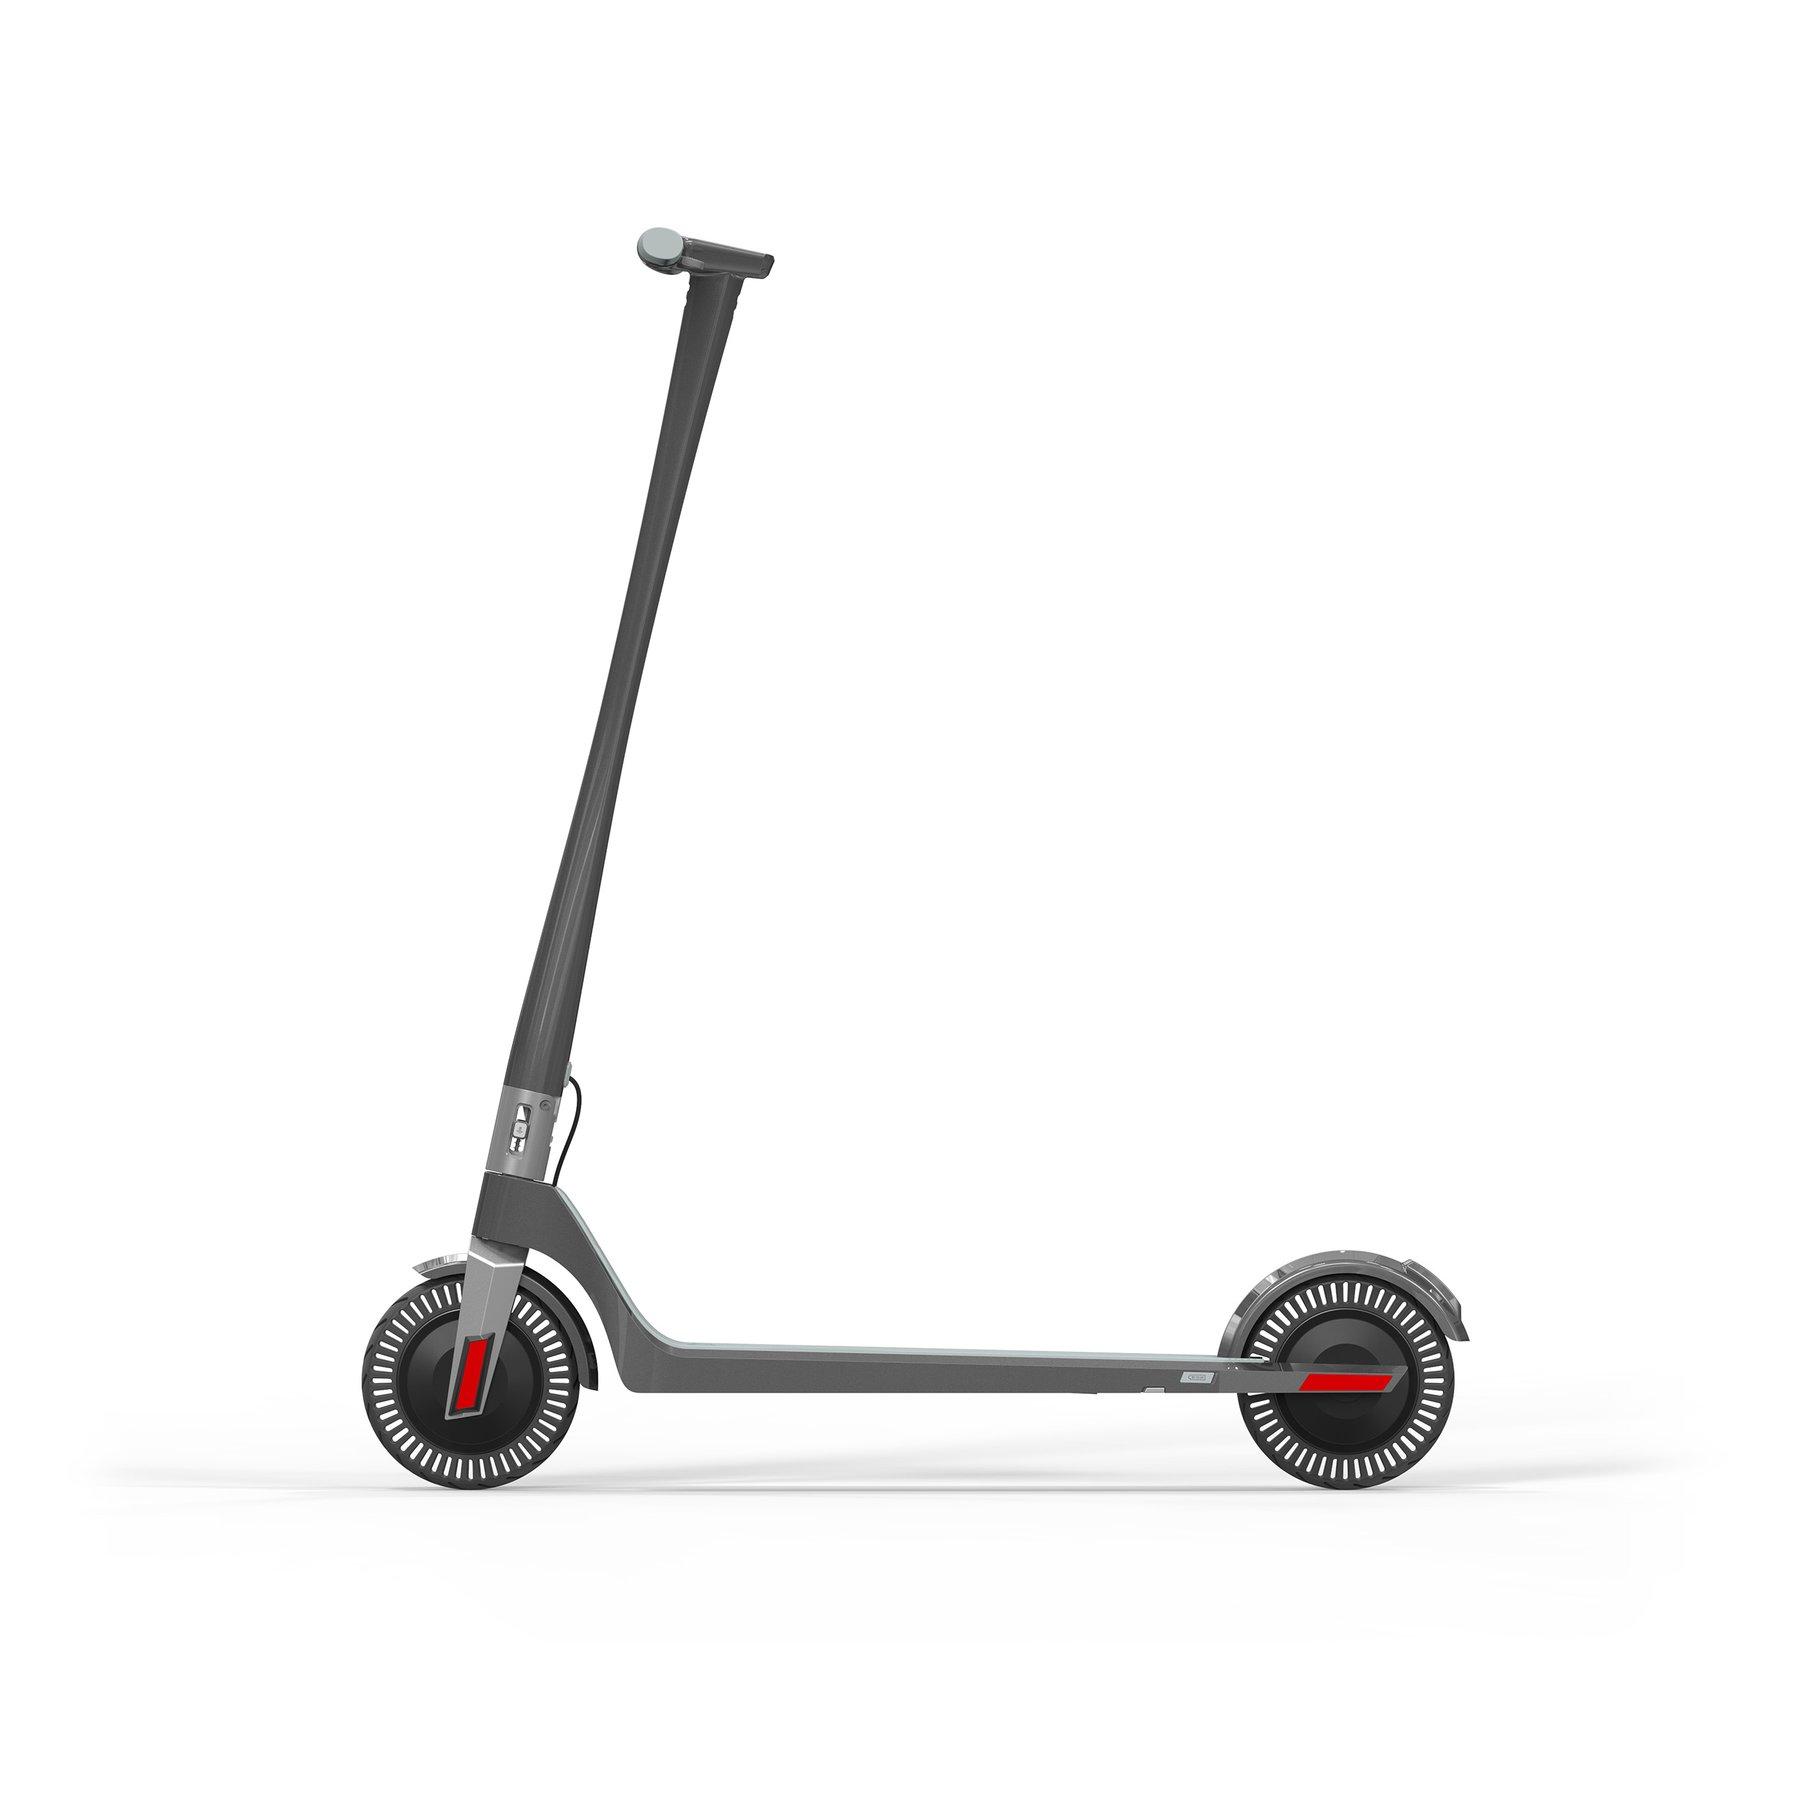 scooter_gotham_01_1800x1800.jpg